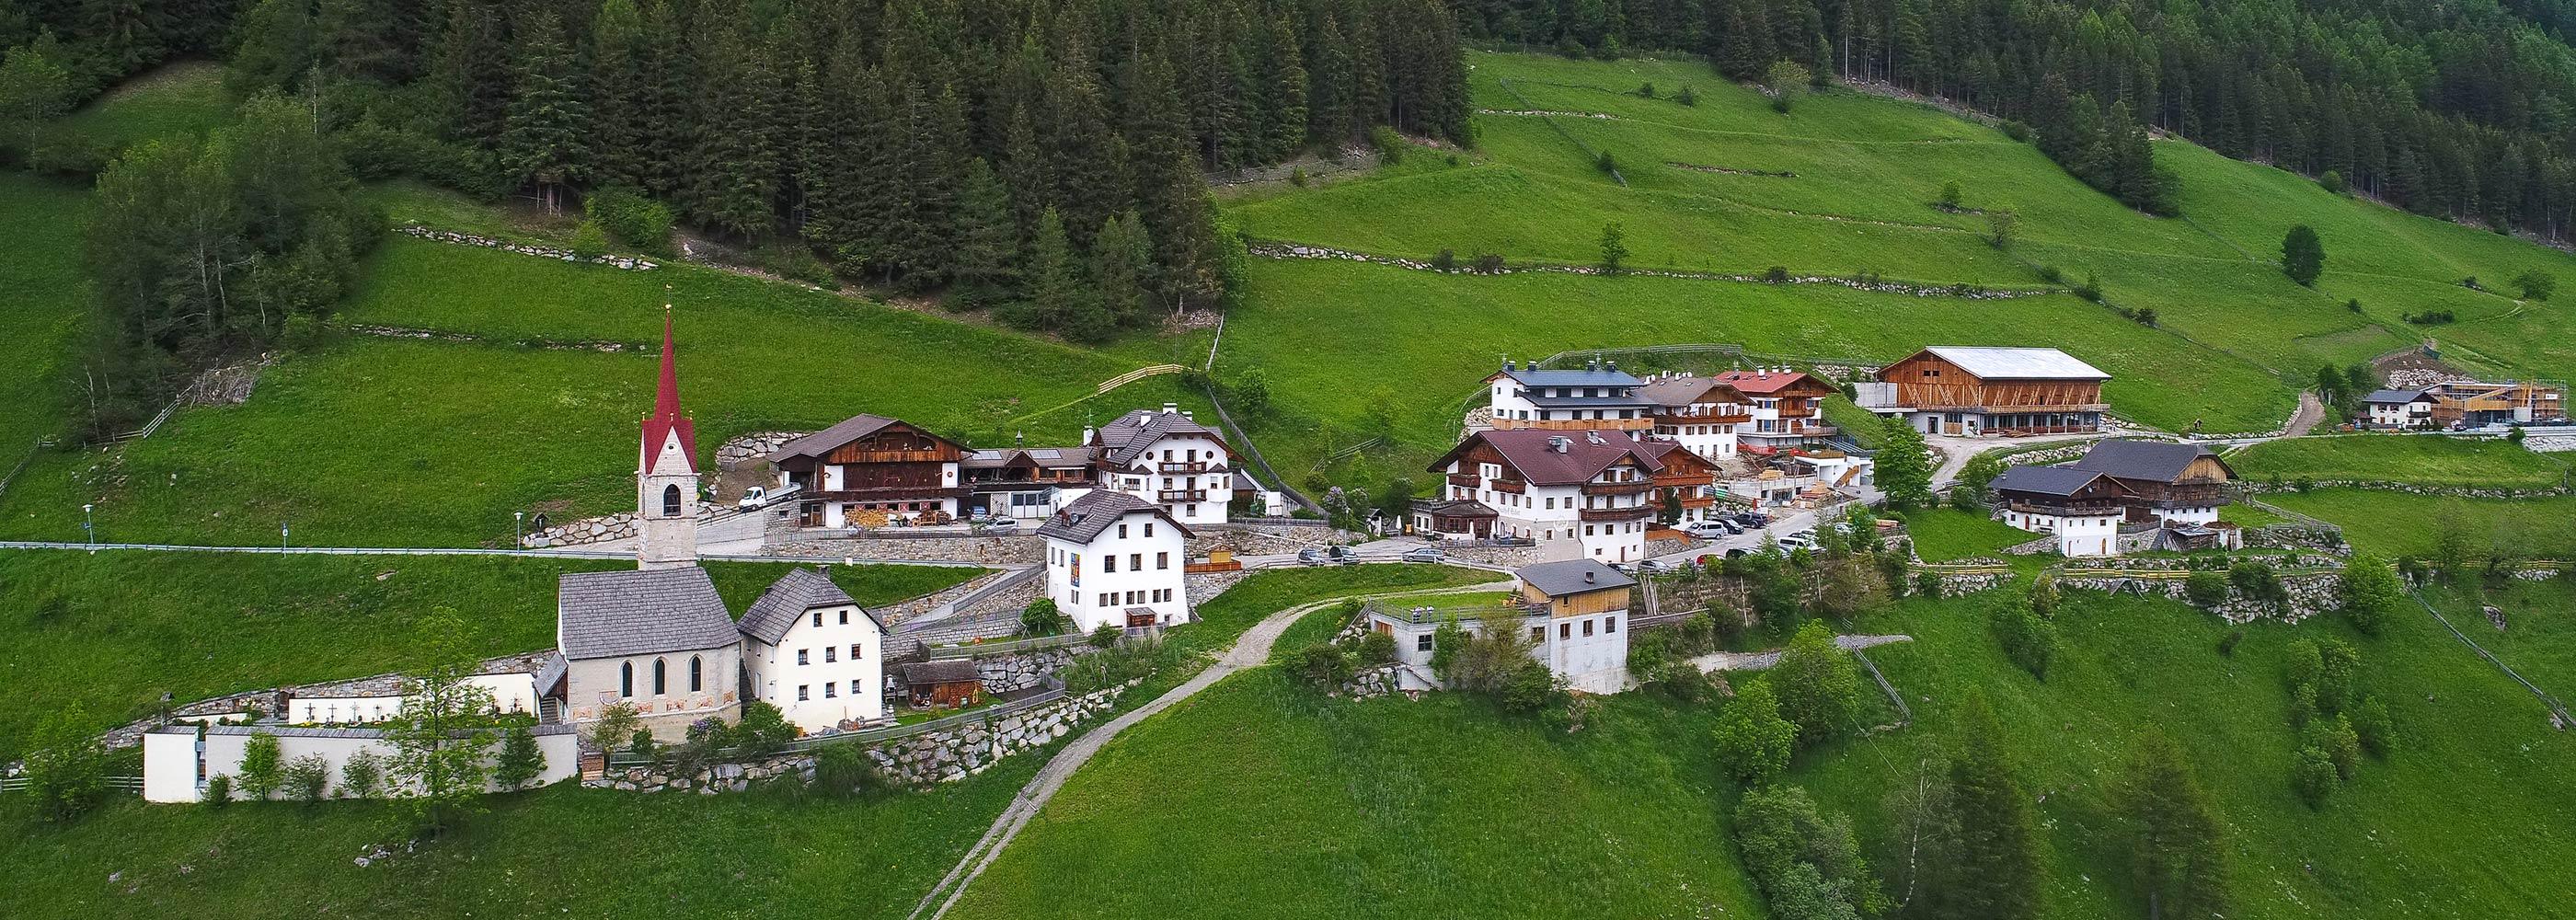 urlaub-gasthof-huber-vacanze-albergo-holidays-hotel-guesthouse